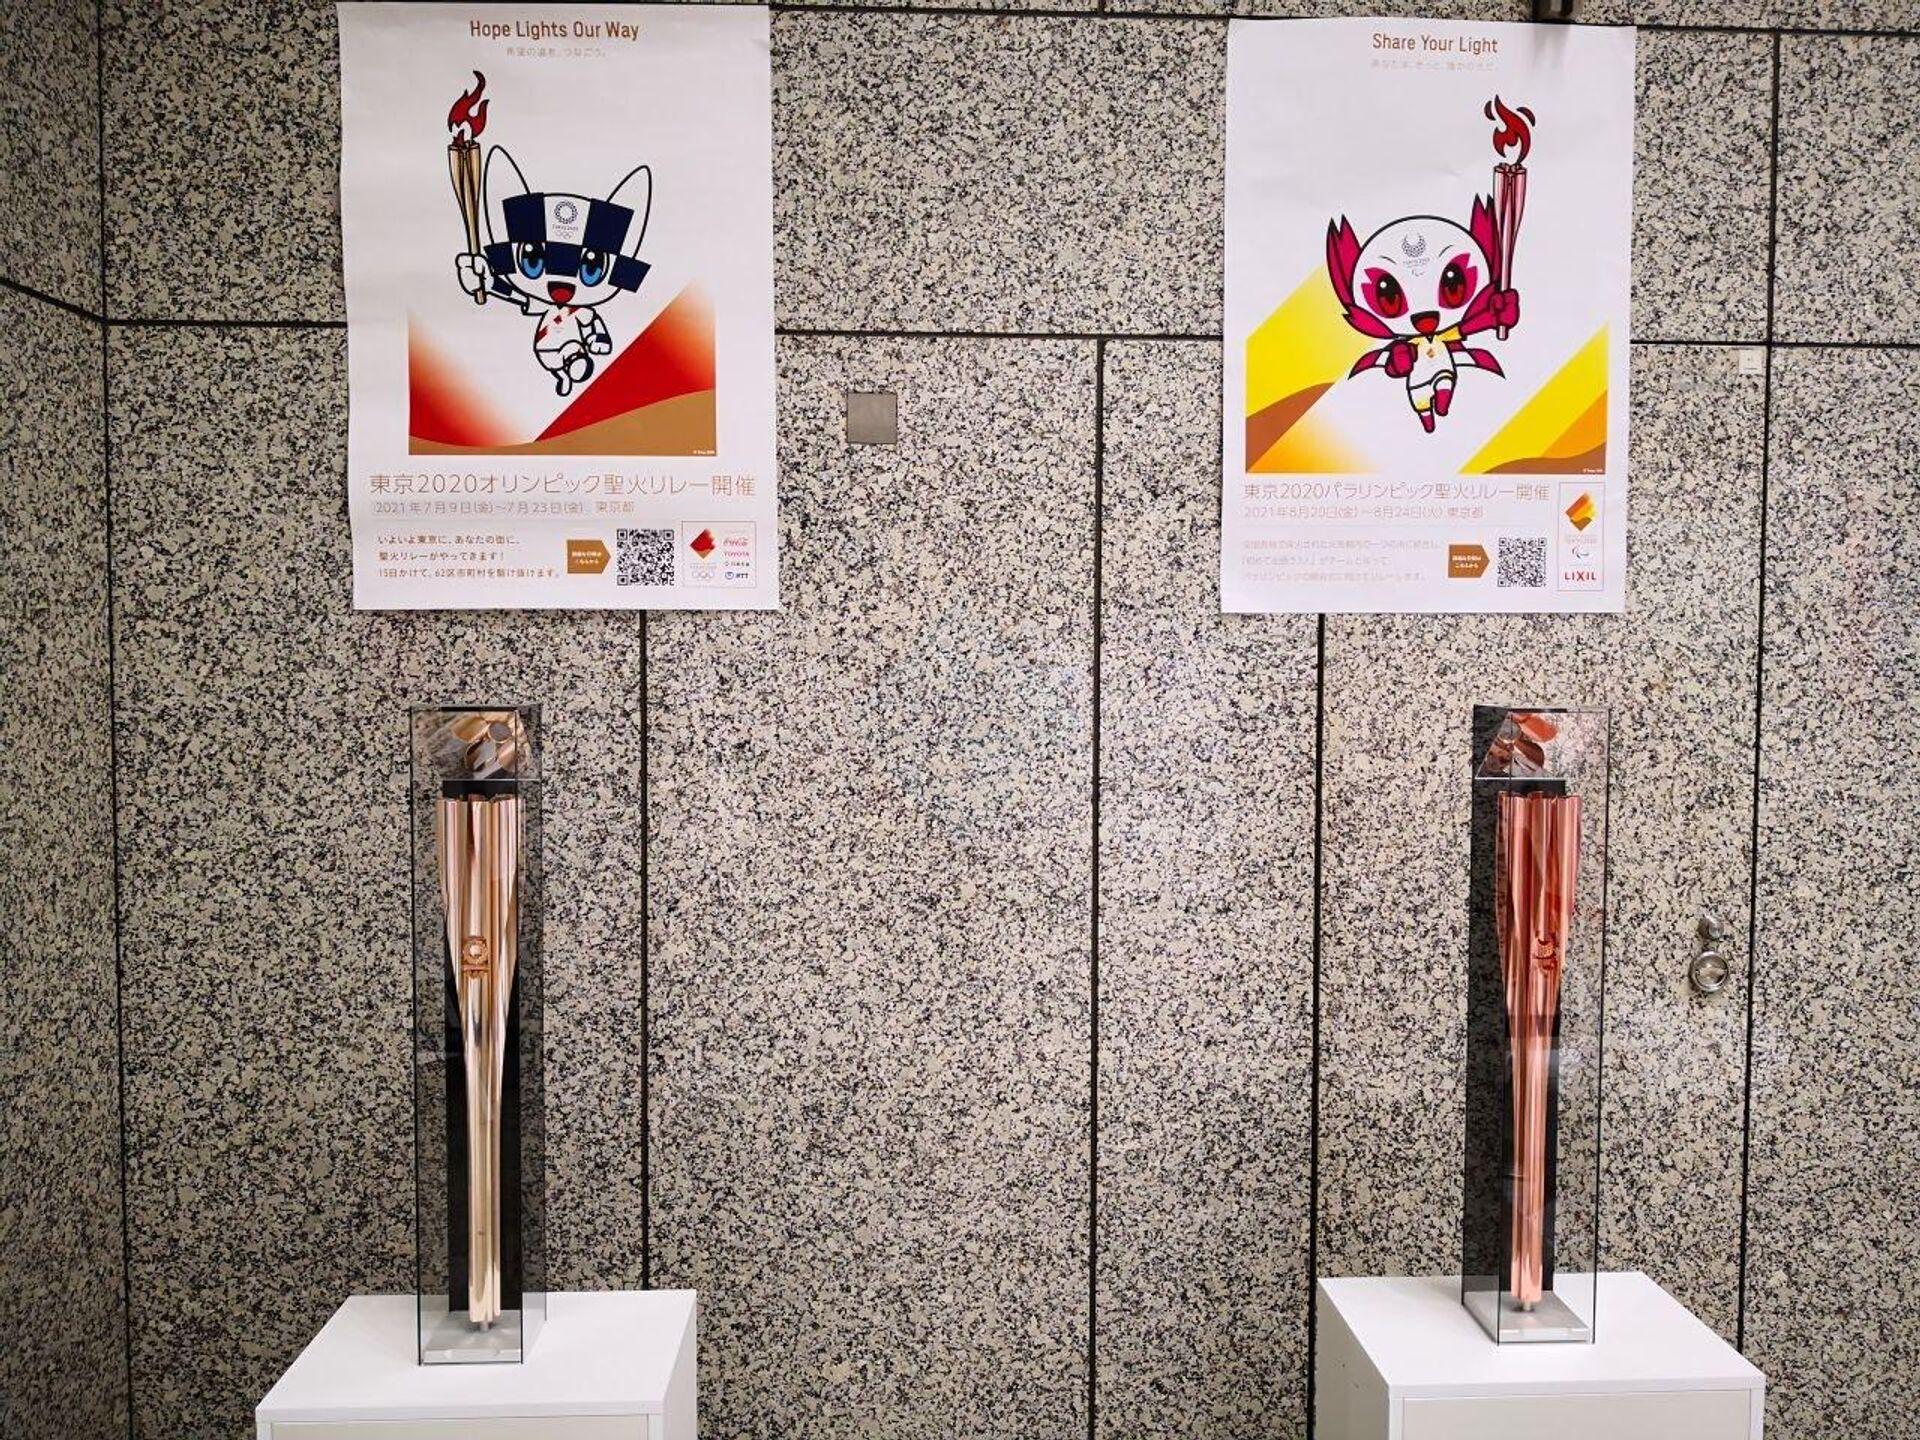 Факелы отложенных на год из-за COVID-19 Олимпиады-2020 и Паралимпийских игр в Токио  - РИА Новости, 1920, 24.05.2021